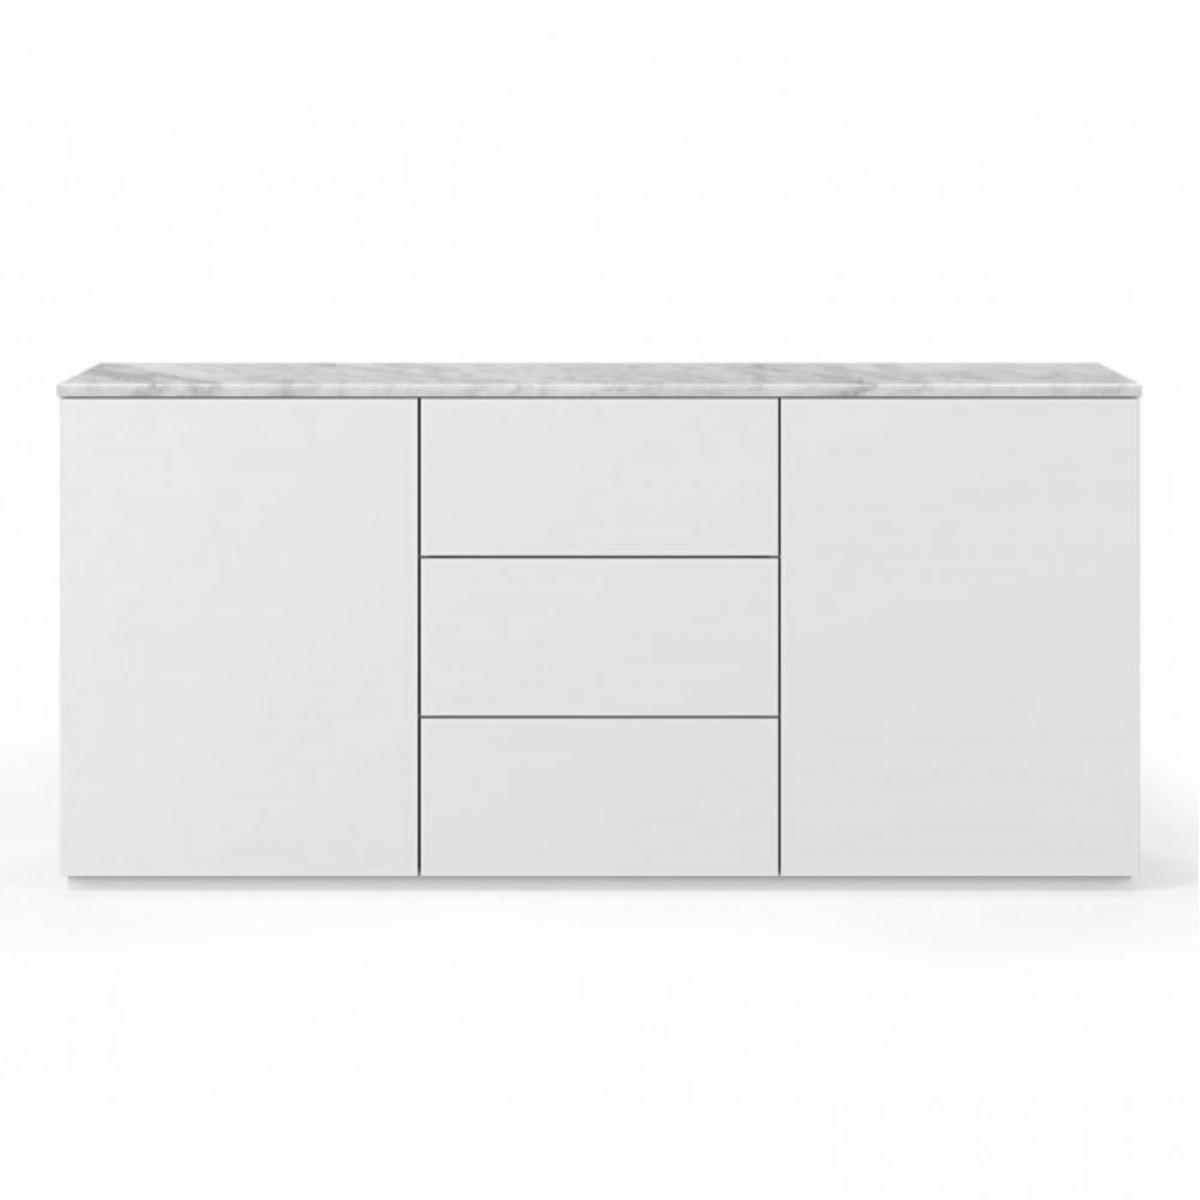 Inside 75 Buffet WHITY 2 blanc mat 180cm 2 portes/3 tiroirs Plateau en Marbre blanc